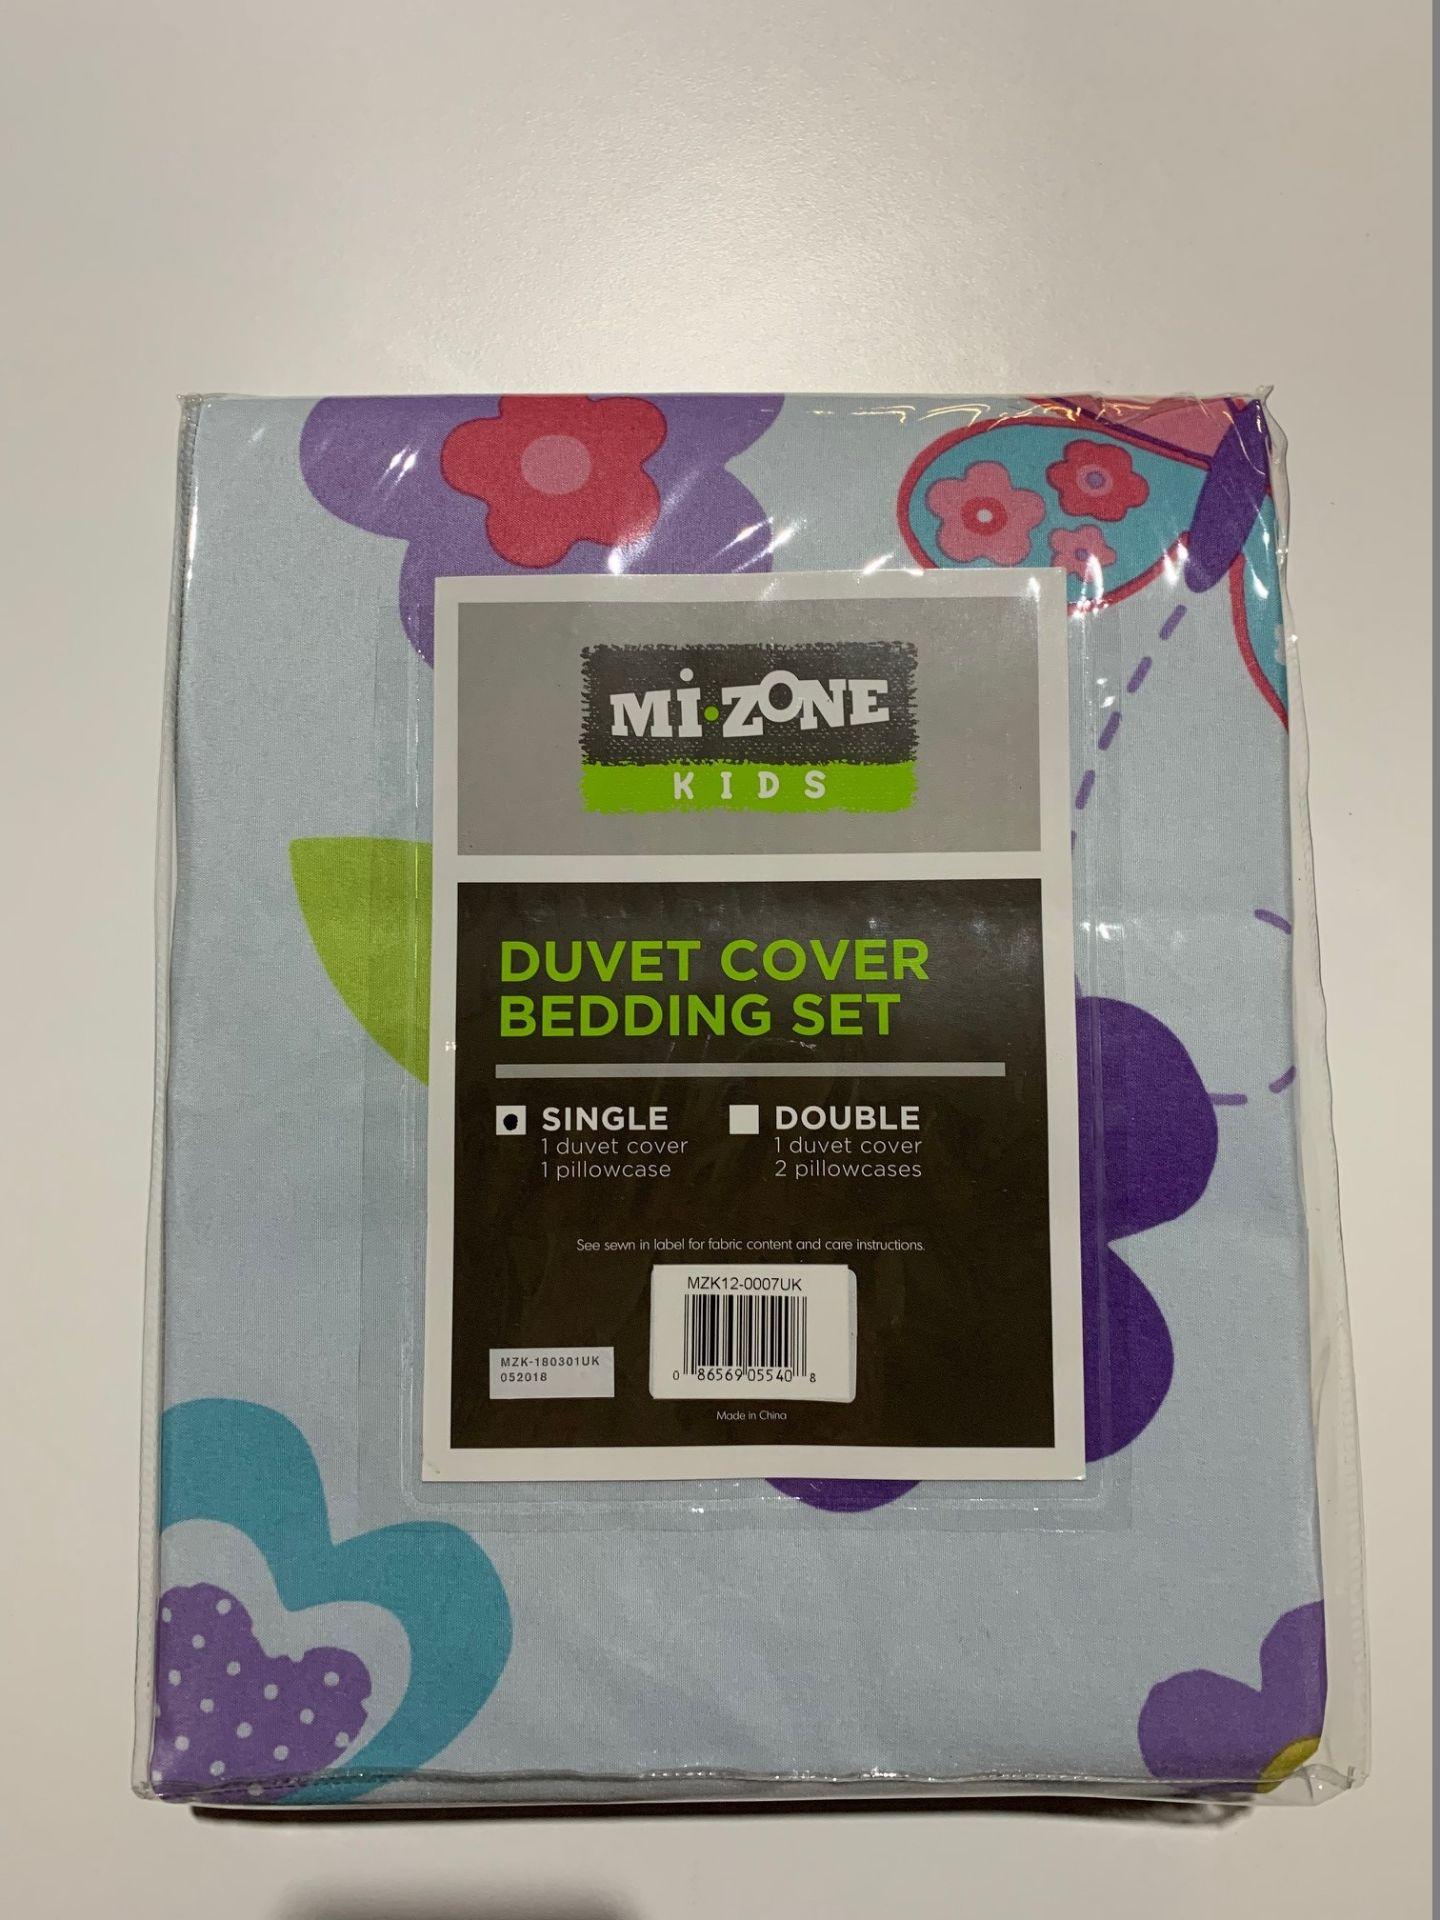 Lot 85 - 1 x Mi-Zone Fluttering Farrah Single Duvet Set - Product Code MZ12-0007UK (Brand New - RRP £21.99)